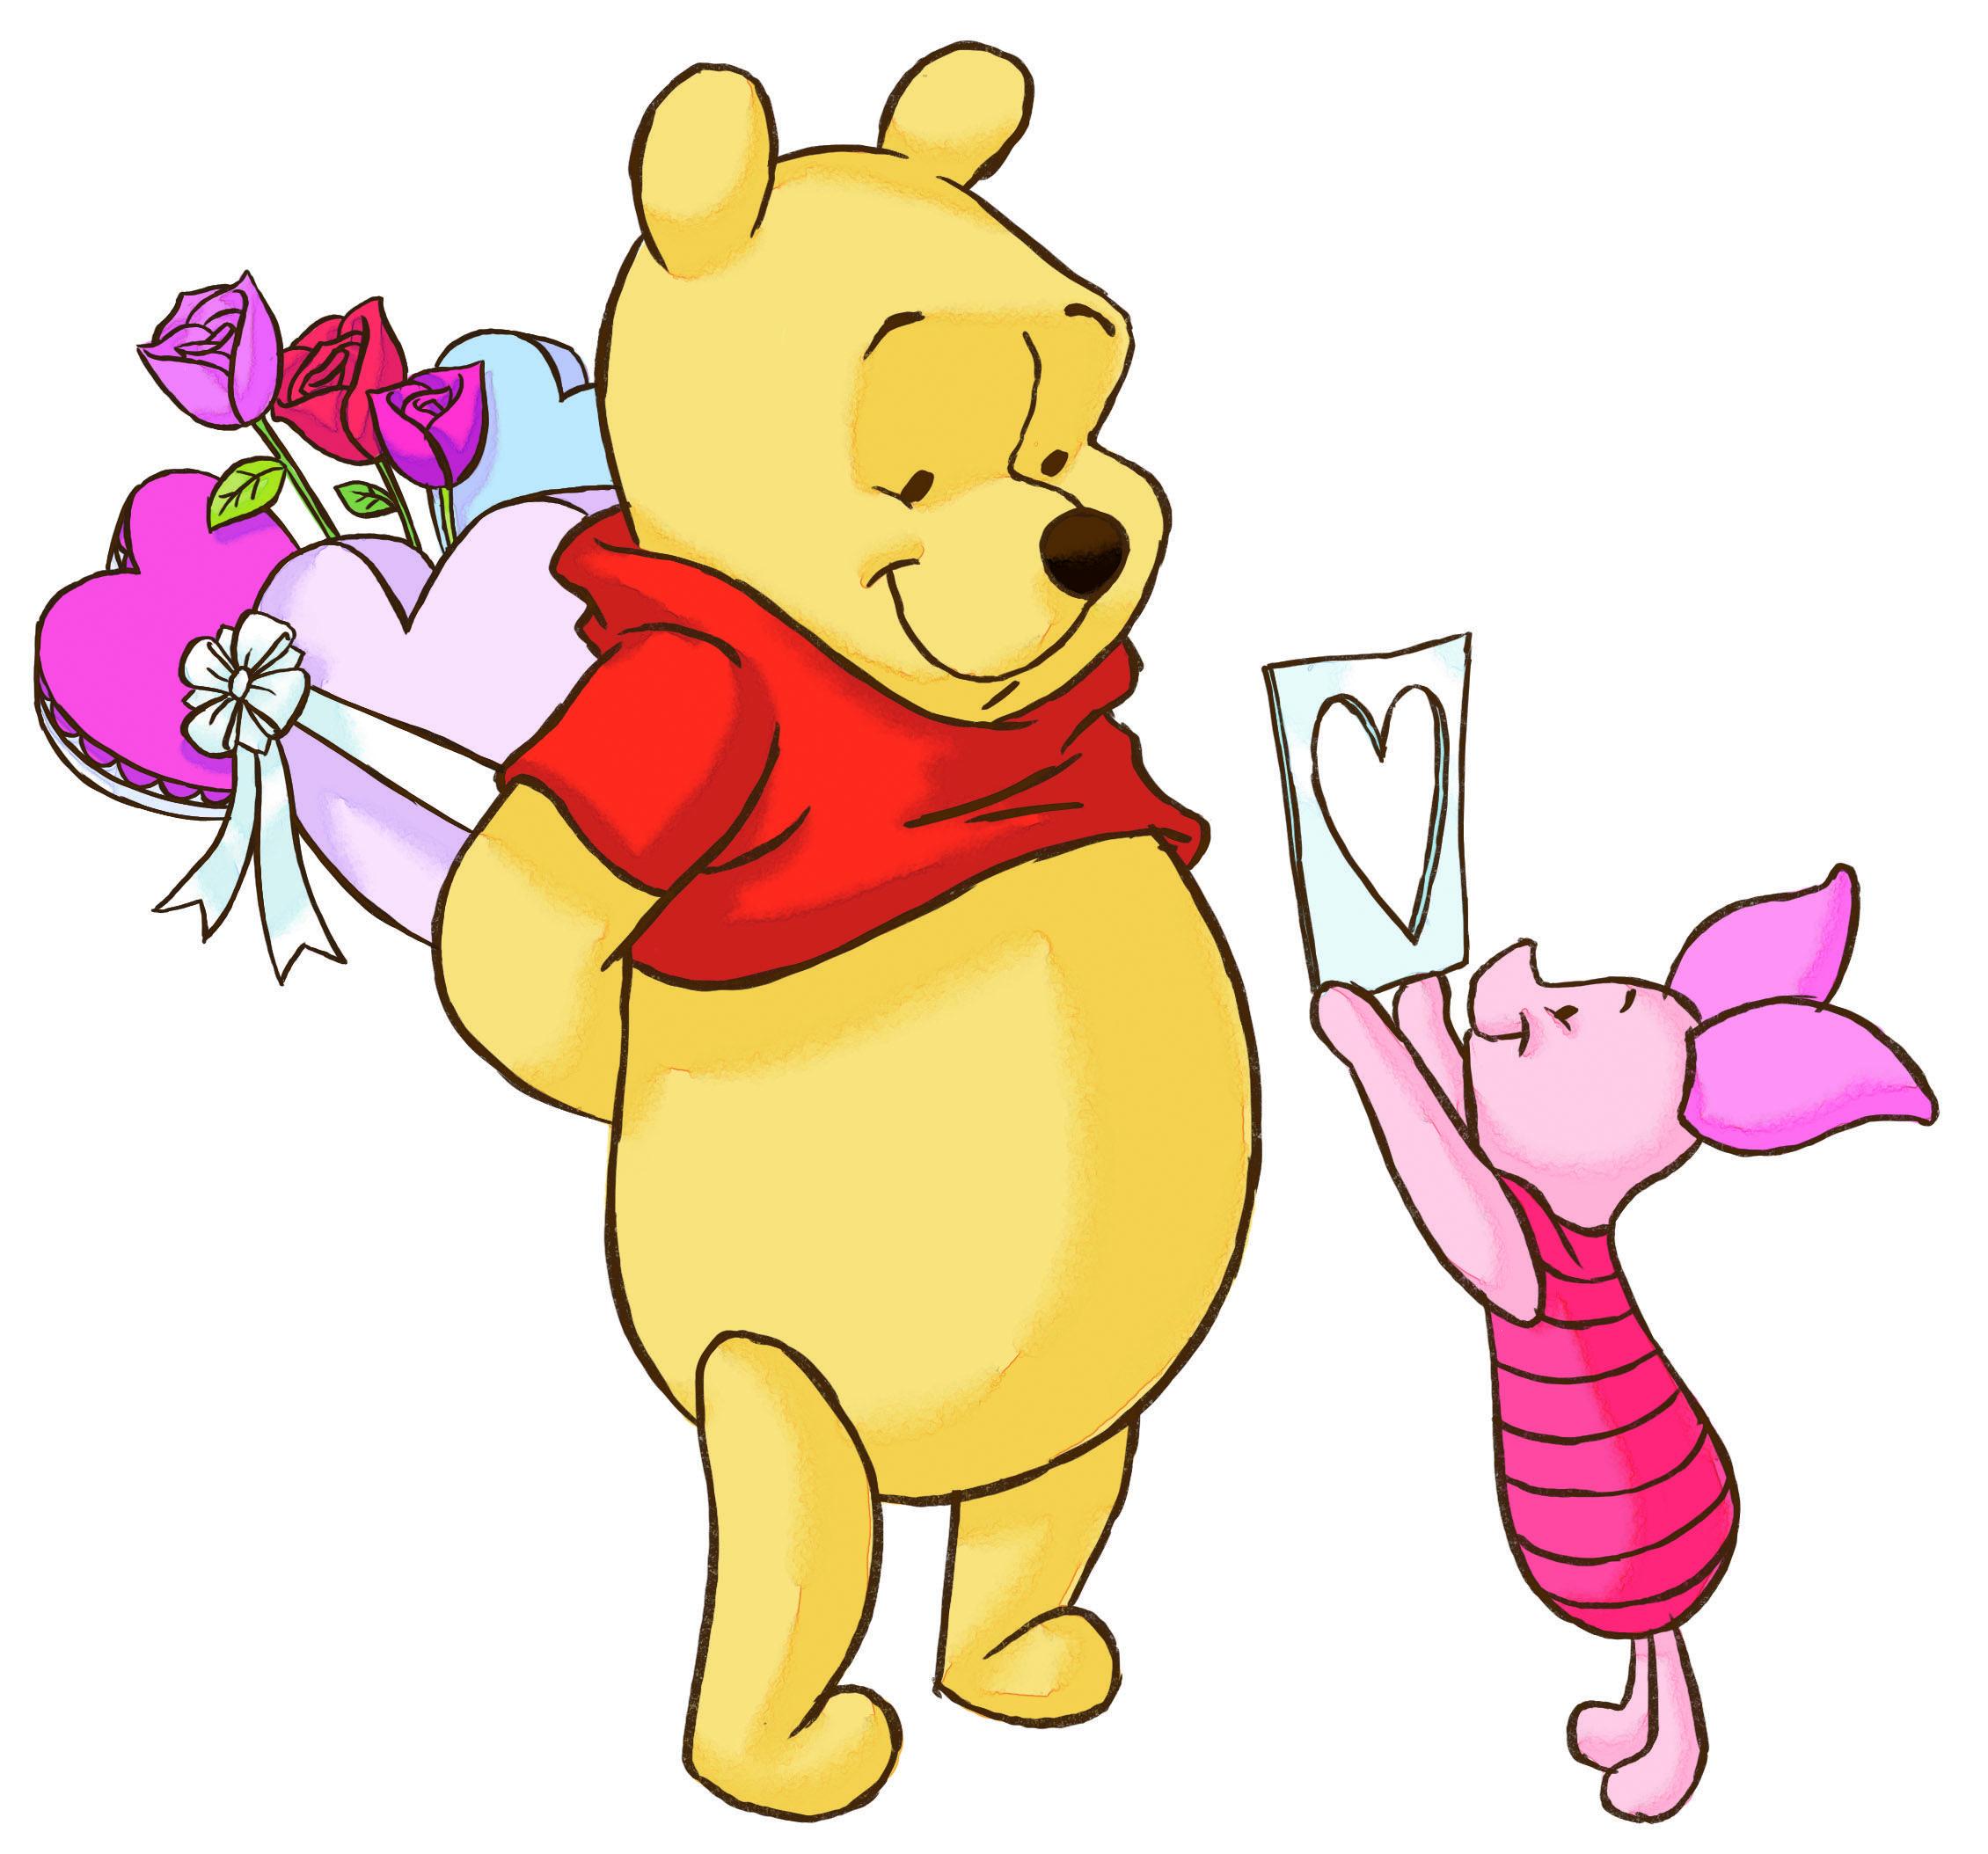 love is all around disney baby love pinterest rh pinterest ca Pooh Bear as a Baby Baby Pooh Bear Drawings